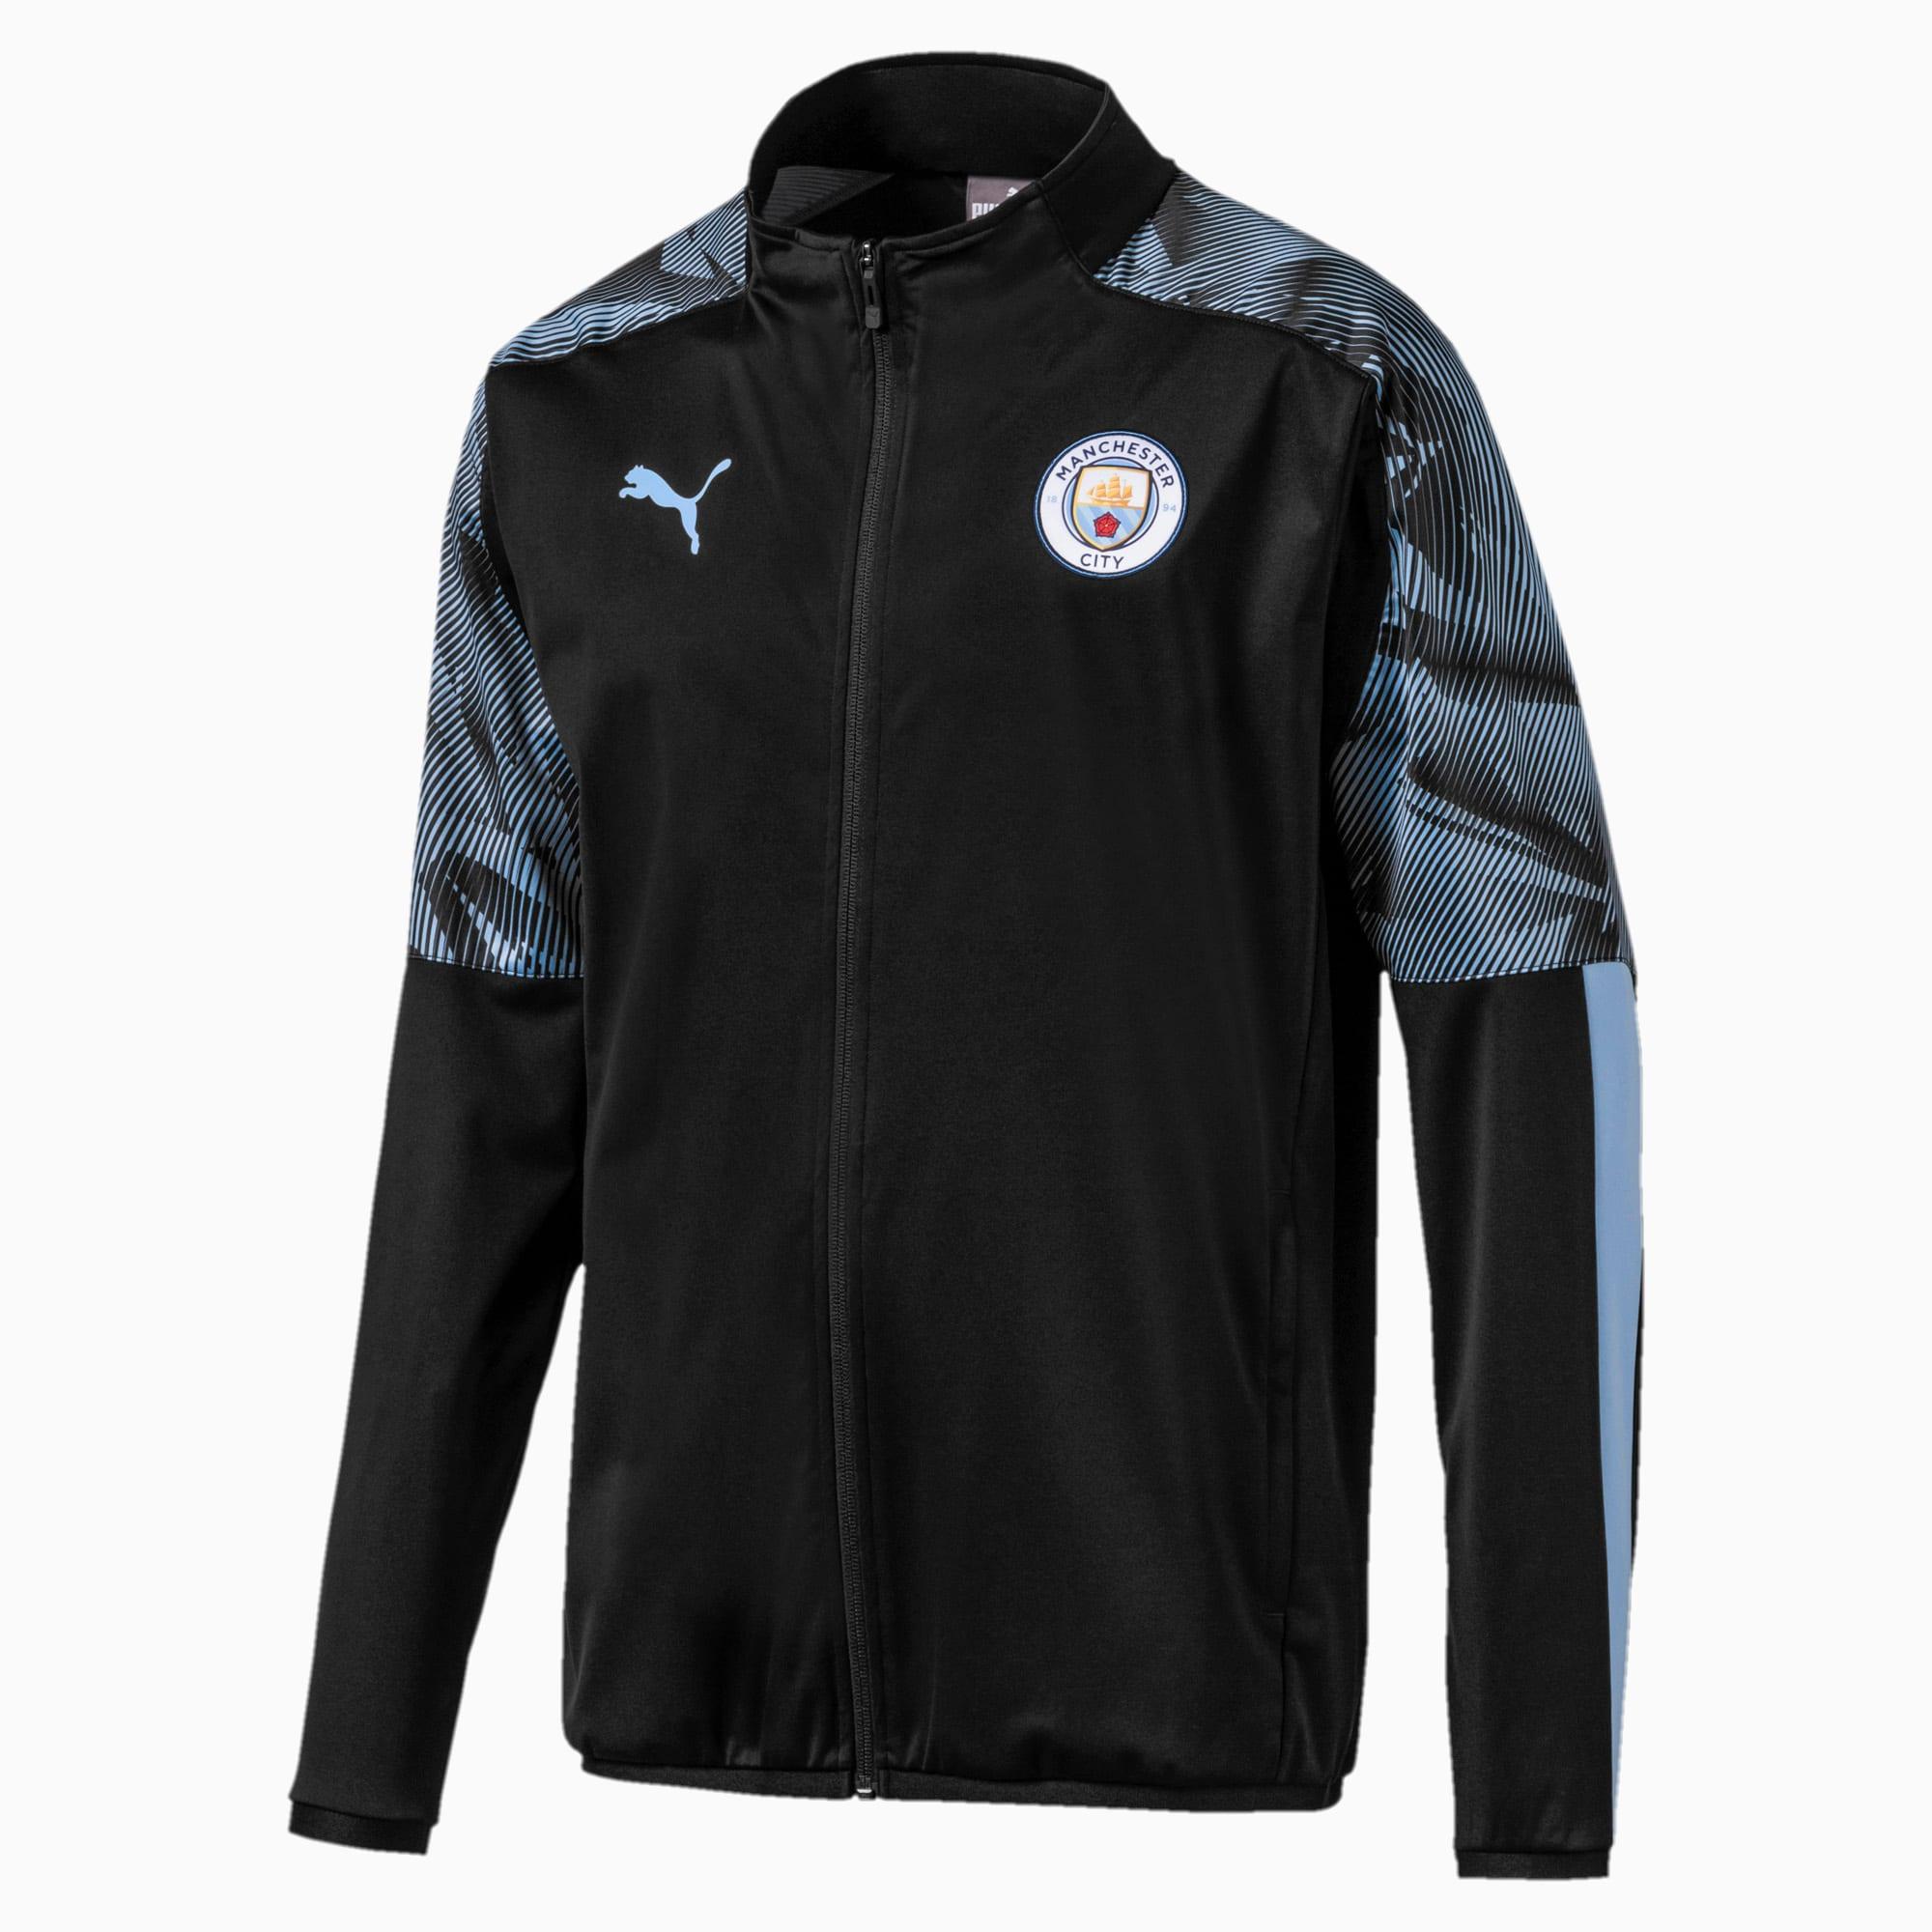 Giacca con zip integrale Manchester City uomo